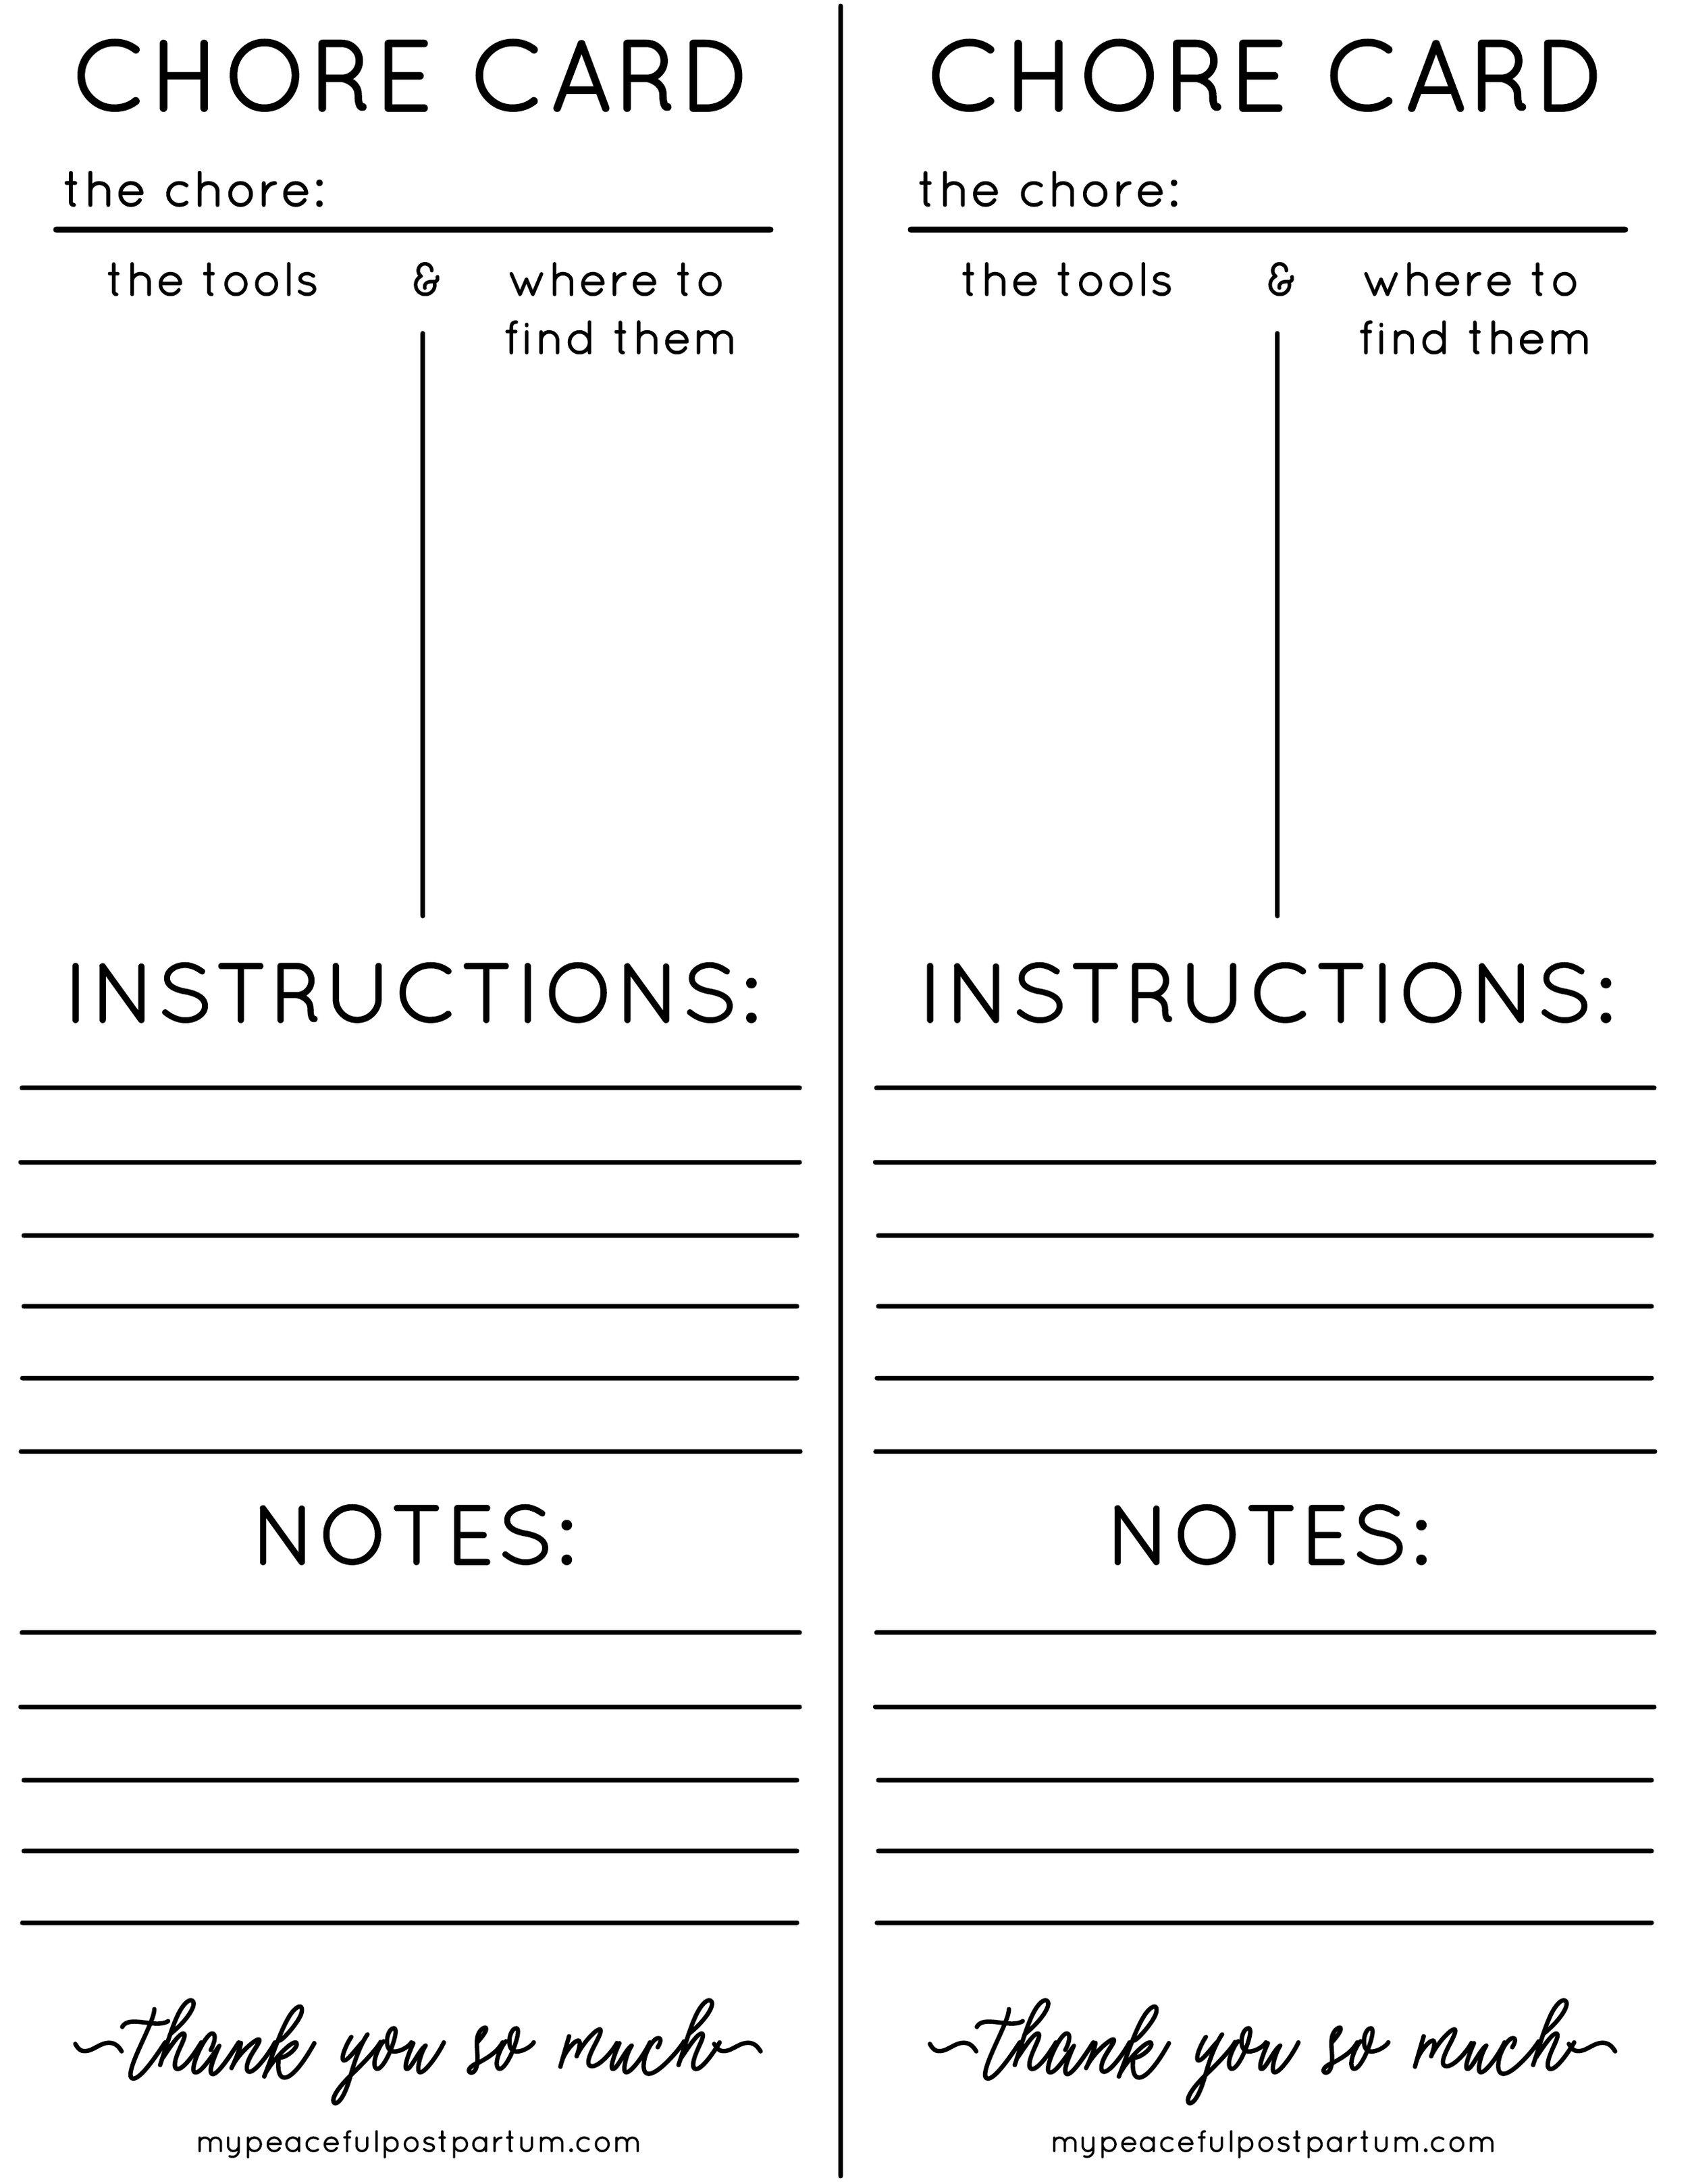 Make the Most of Postpartum Visitors Free Printable Chore Card (Black & White)